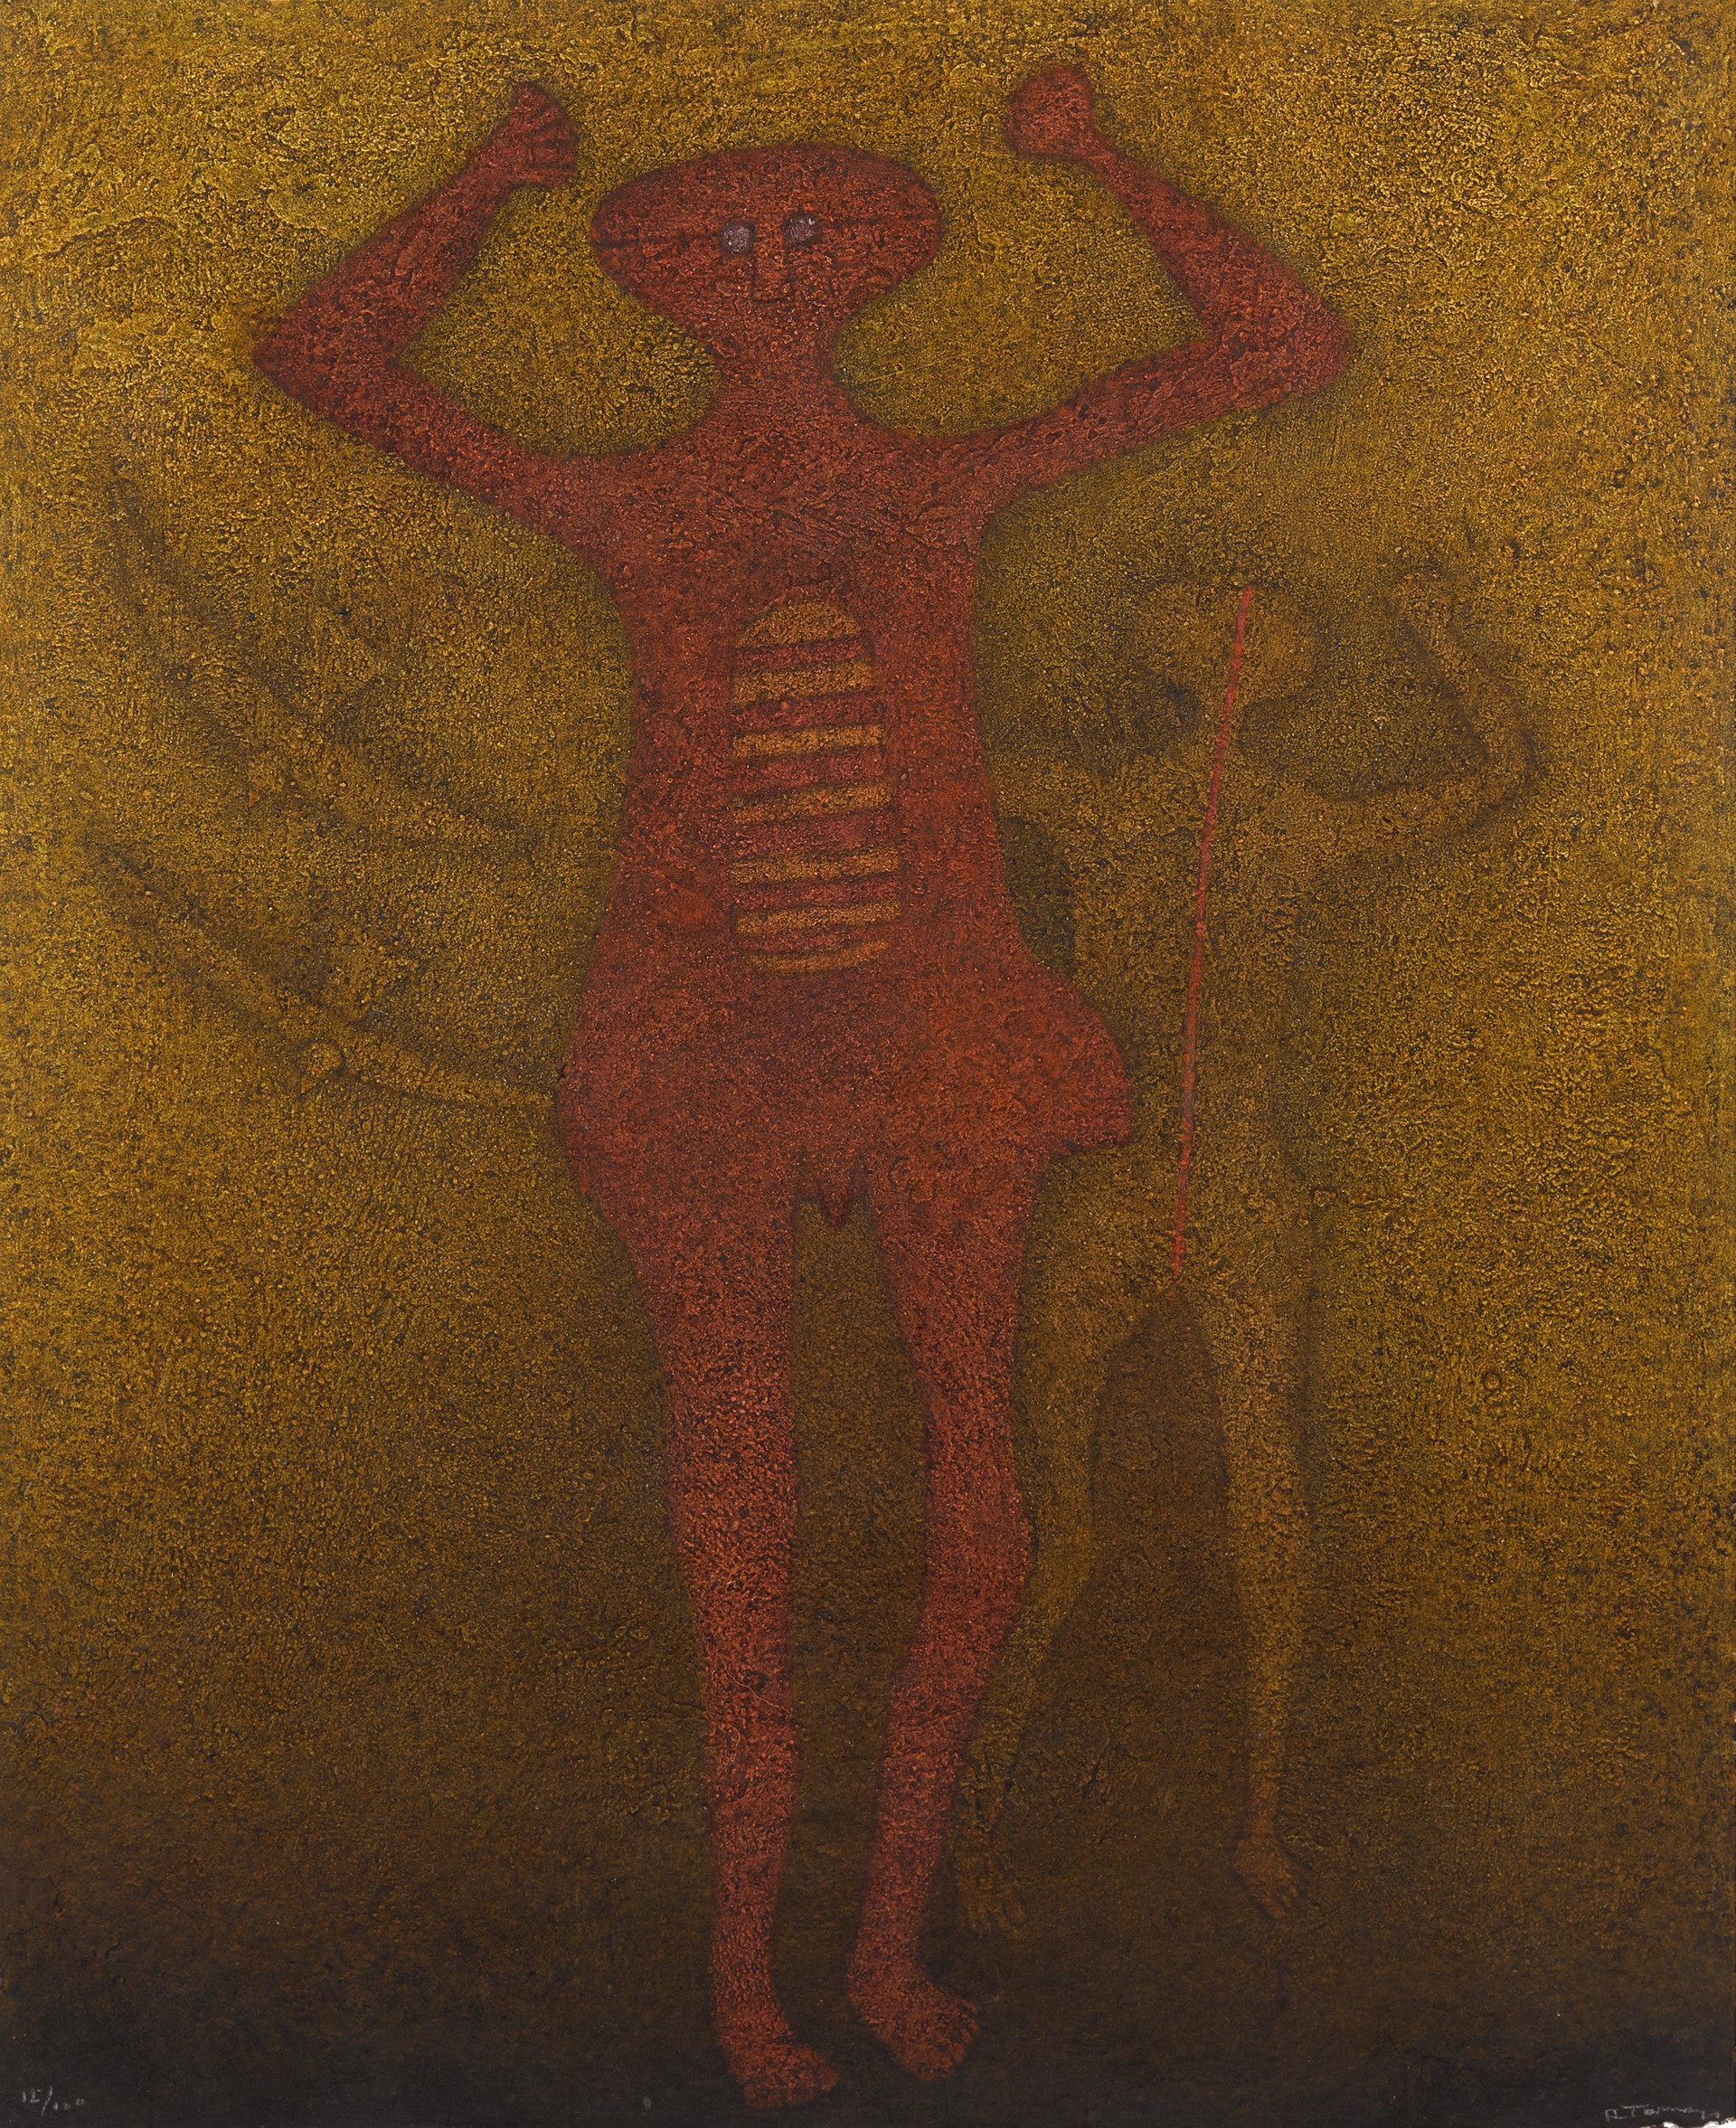 Personajes con Pájaros (Framed) by Rufino Tamayo (1899 - 1991)